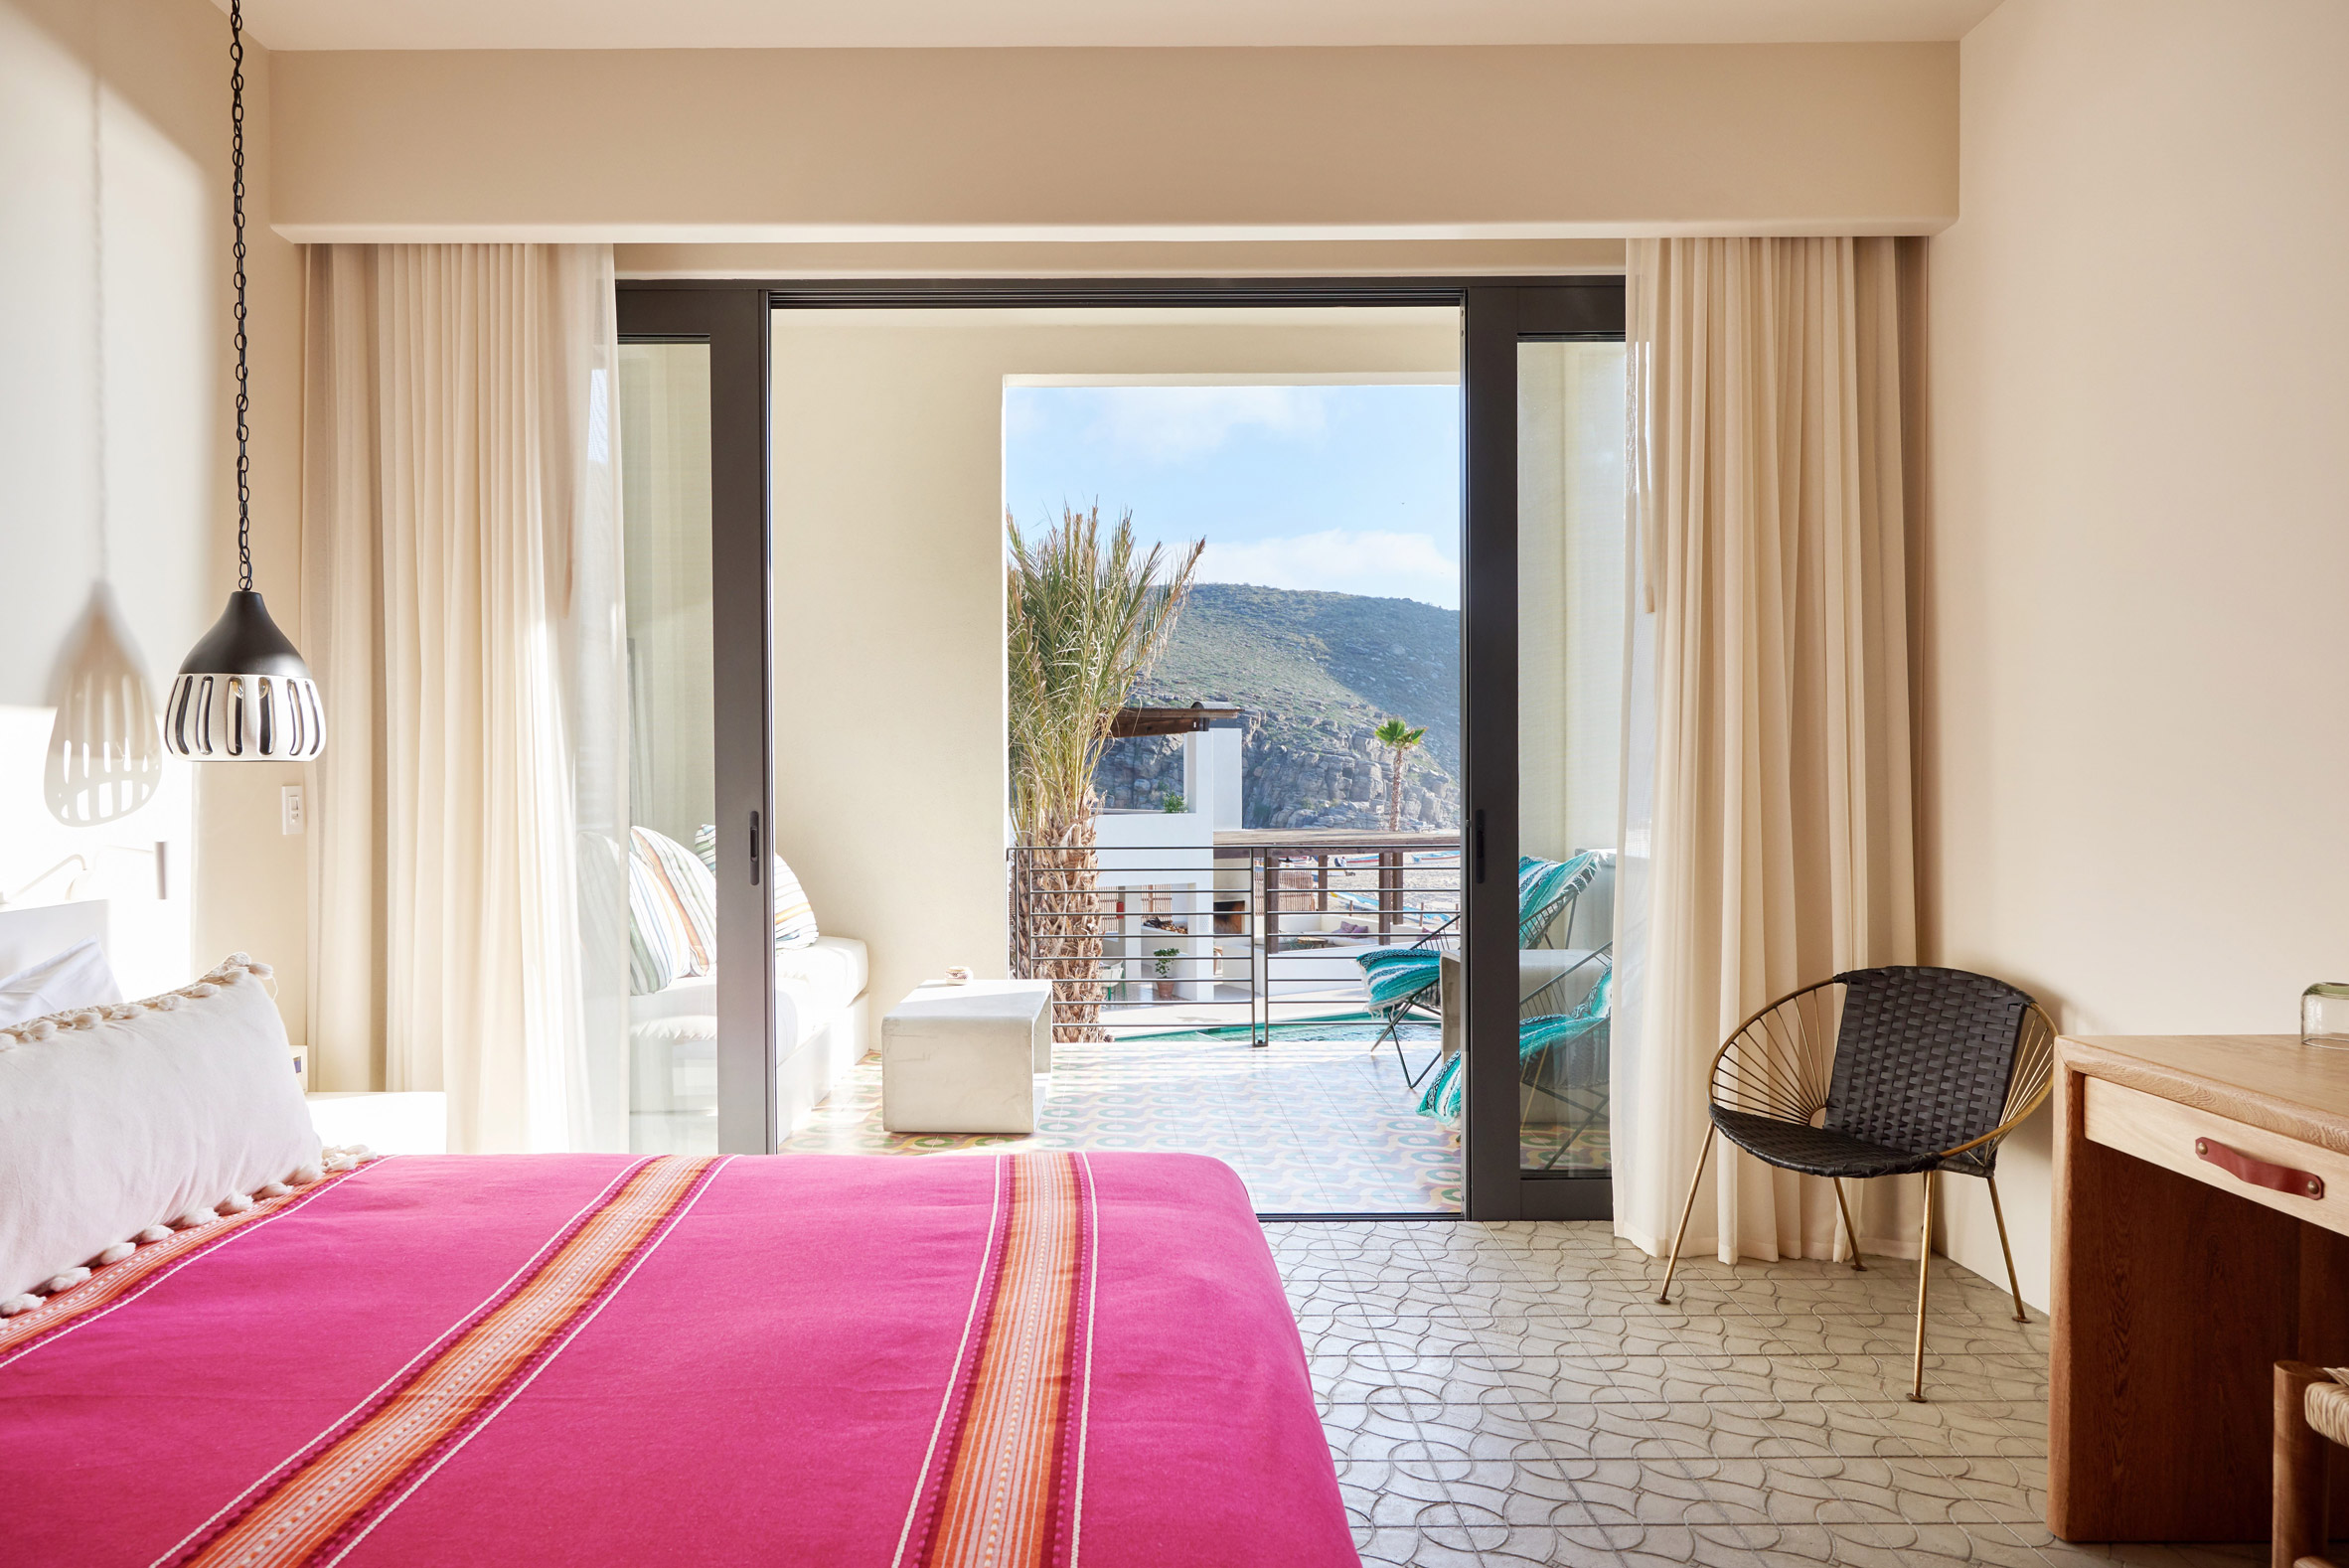 Hotel San Cristobal by Lake Flato